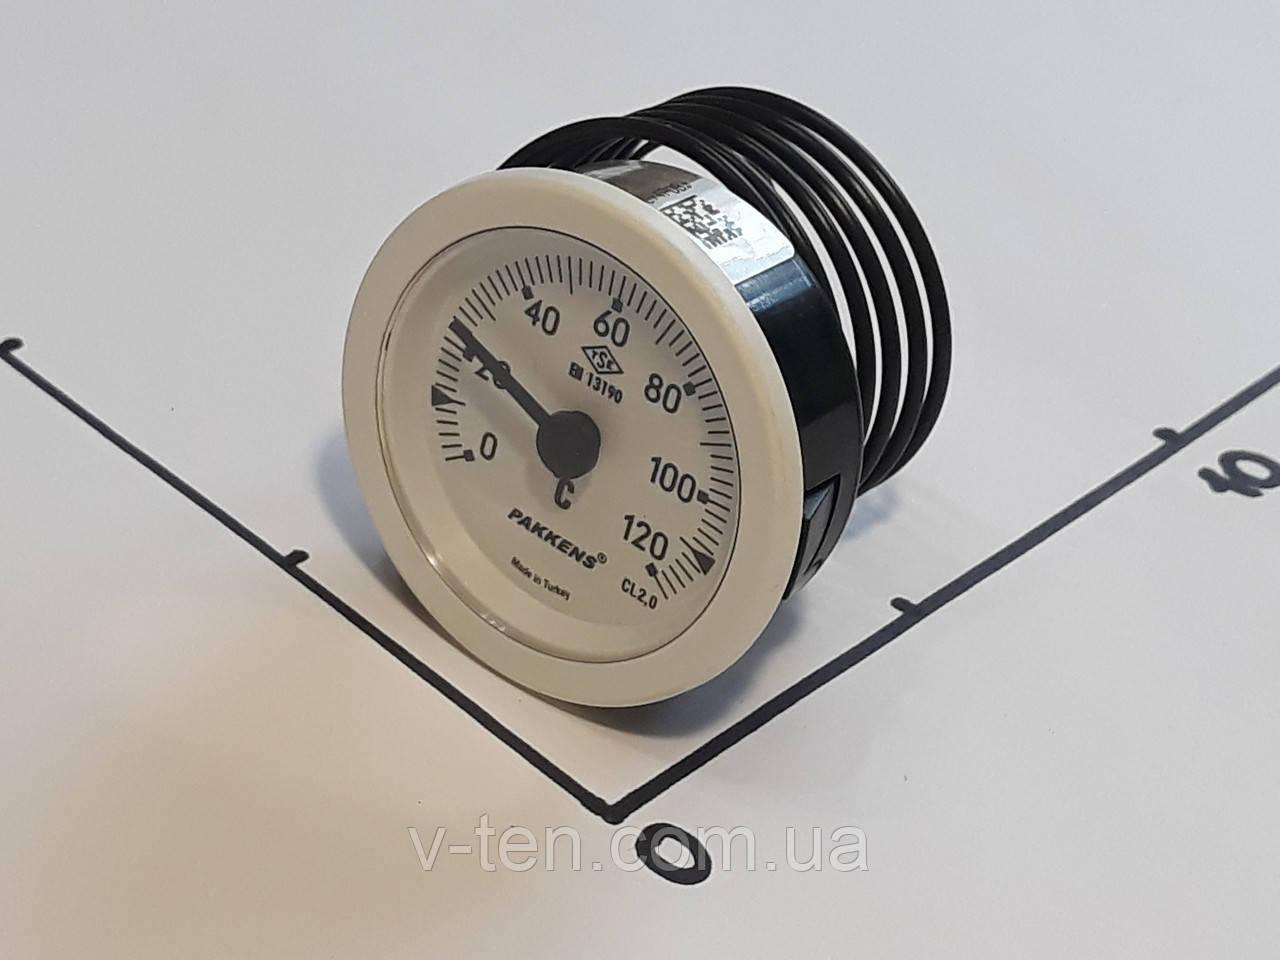 Термометр Ø52мм / 120°С / L-100 cм PAKKENS капиллярный (Турция)